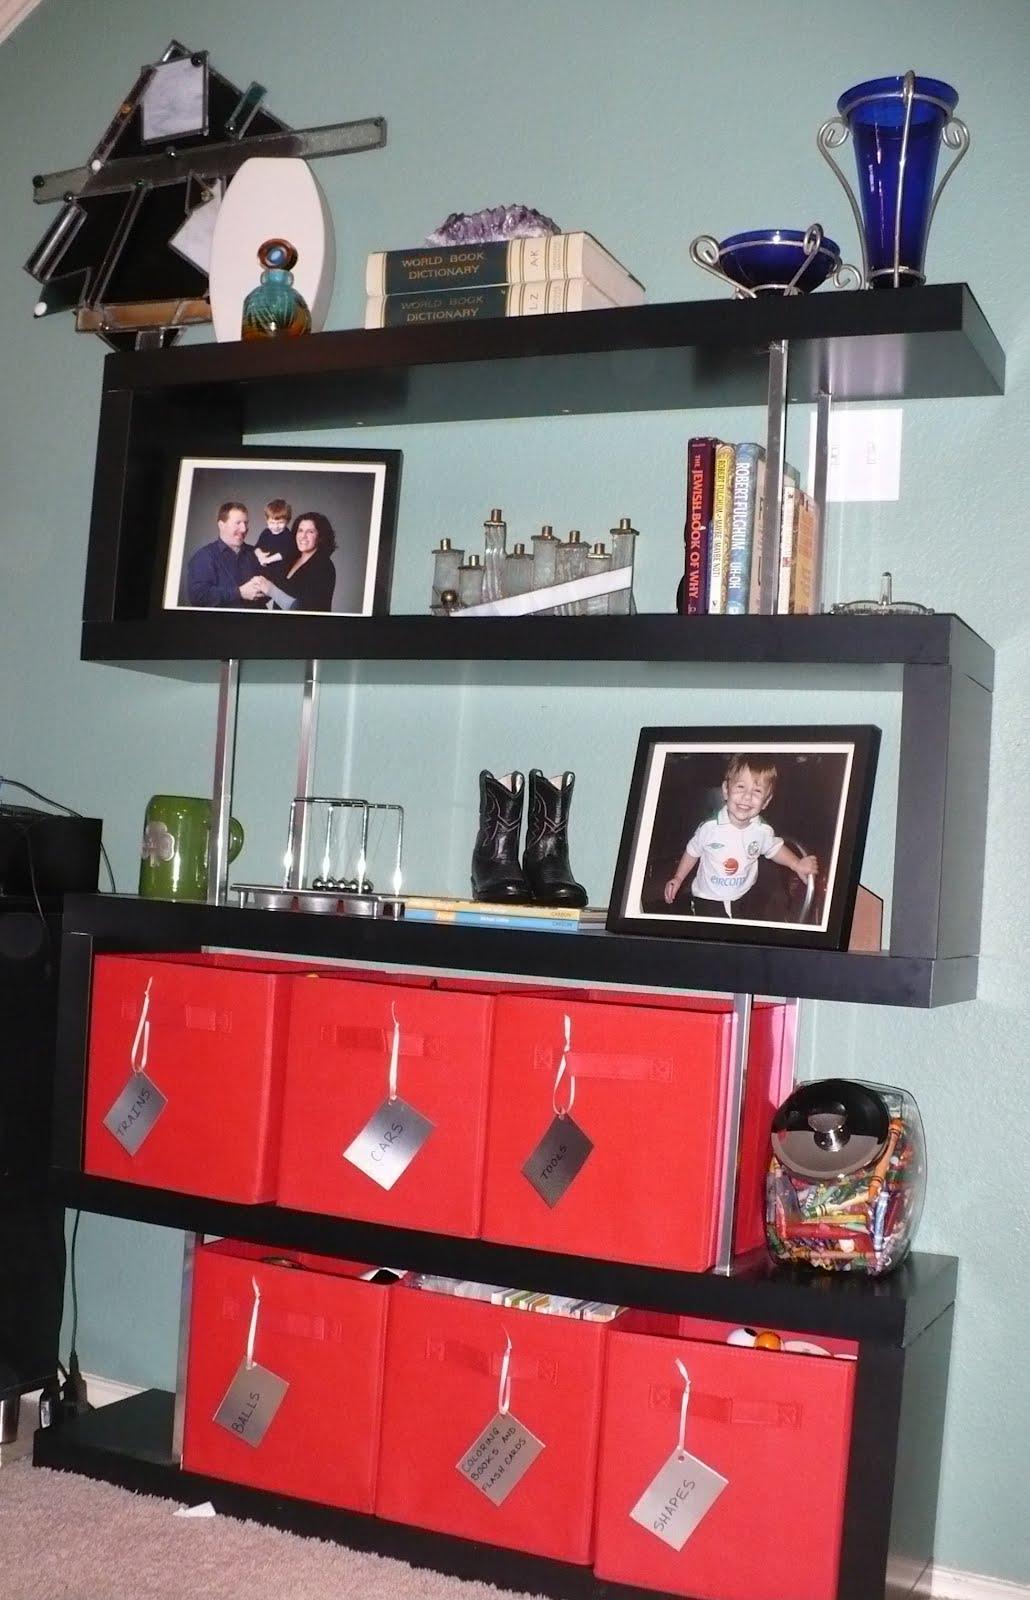 Zig zag lack shelf bookcase ikea hackers for Miroir zig zag ikea